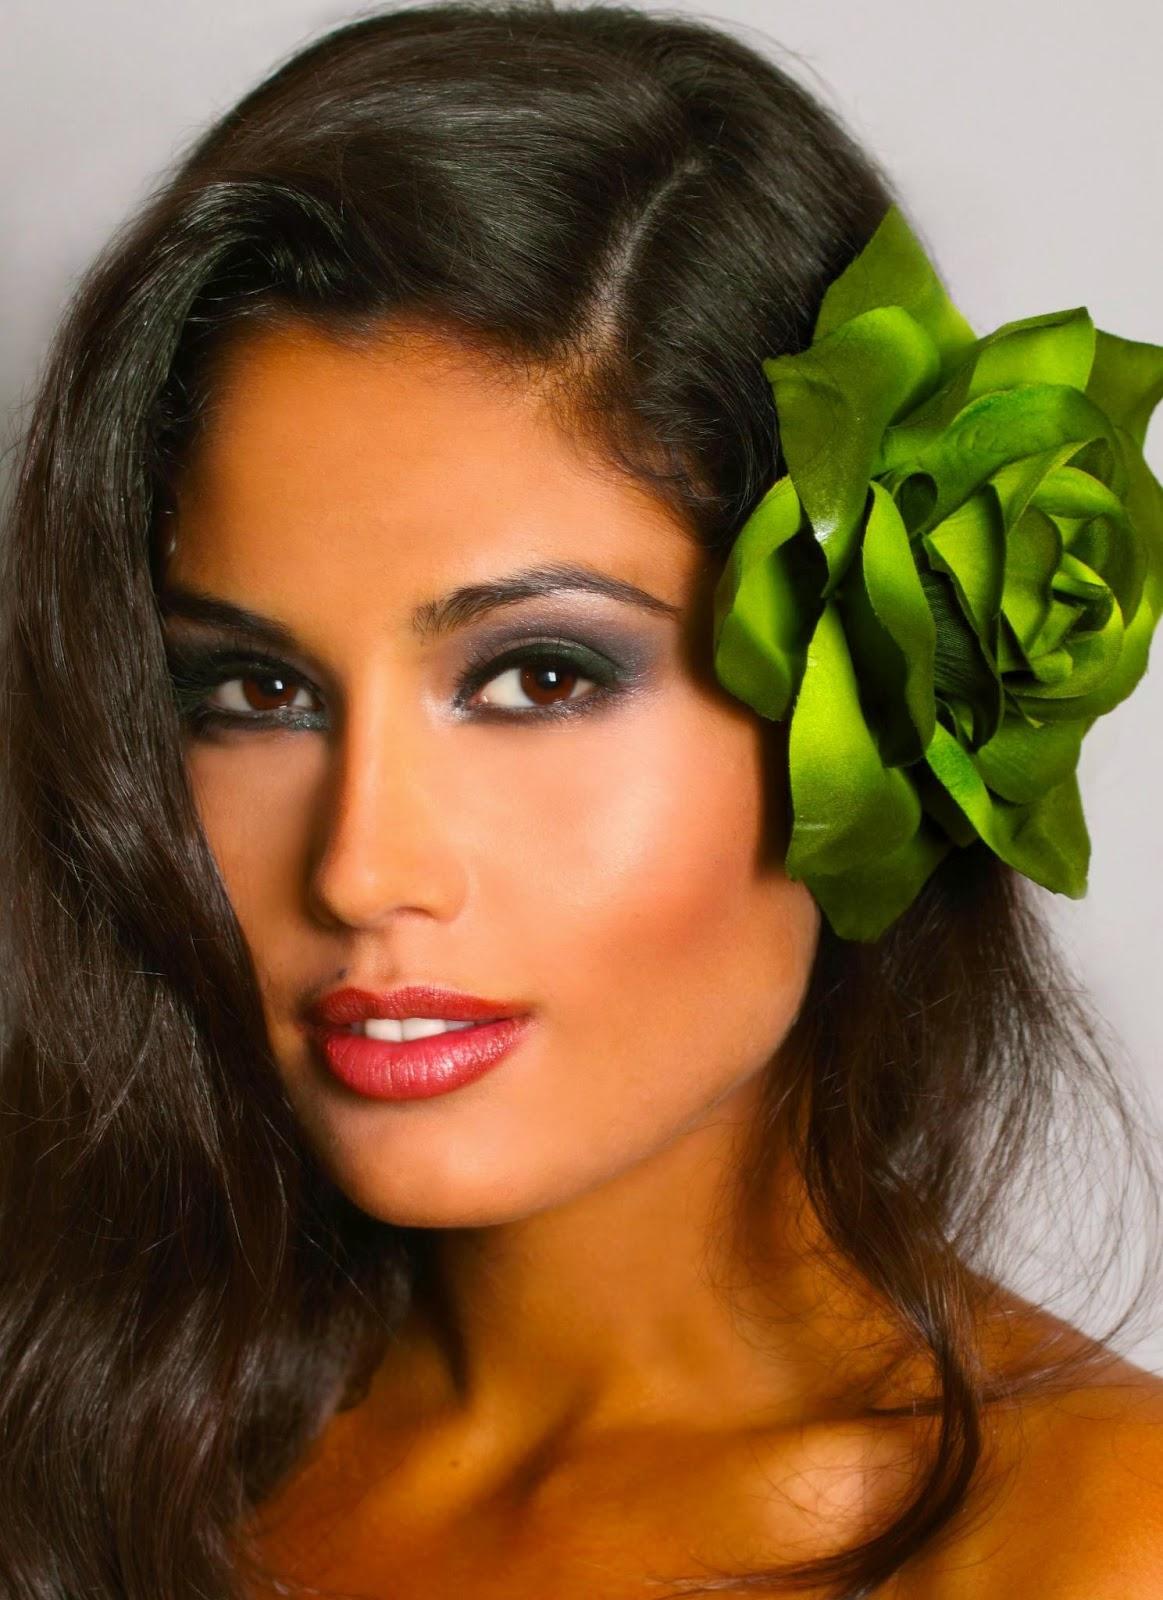 拉丁娜閣 Bellezas Latinas: Miss Universe Spain 2013